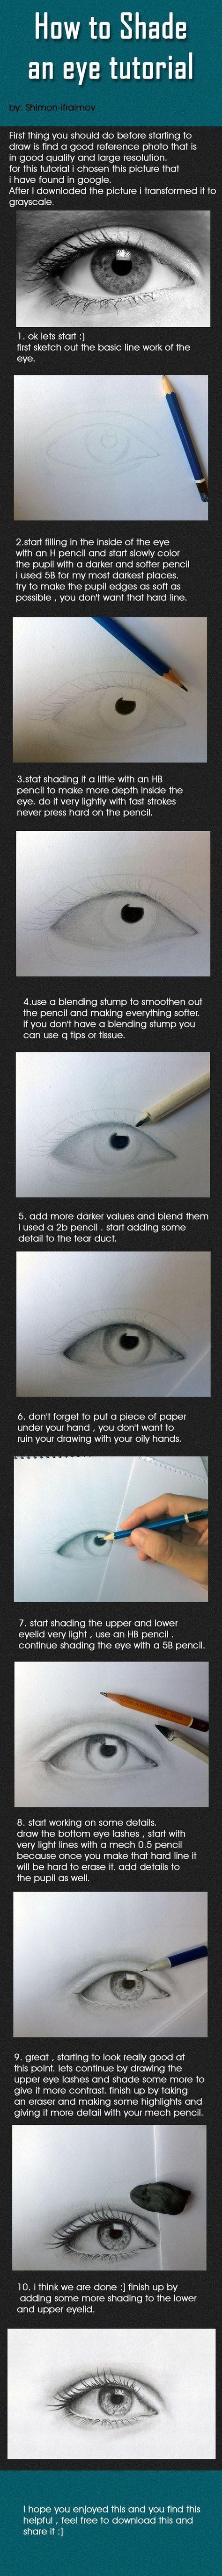 Eye Tutorial by Shimon-Ifraimov.deviantart.com on @deviantART: